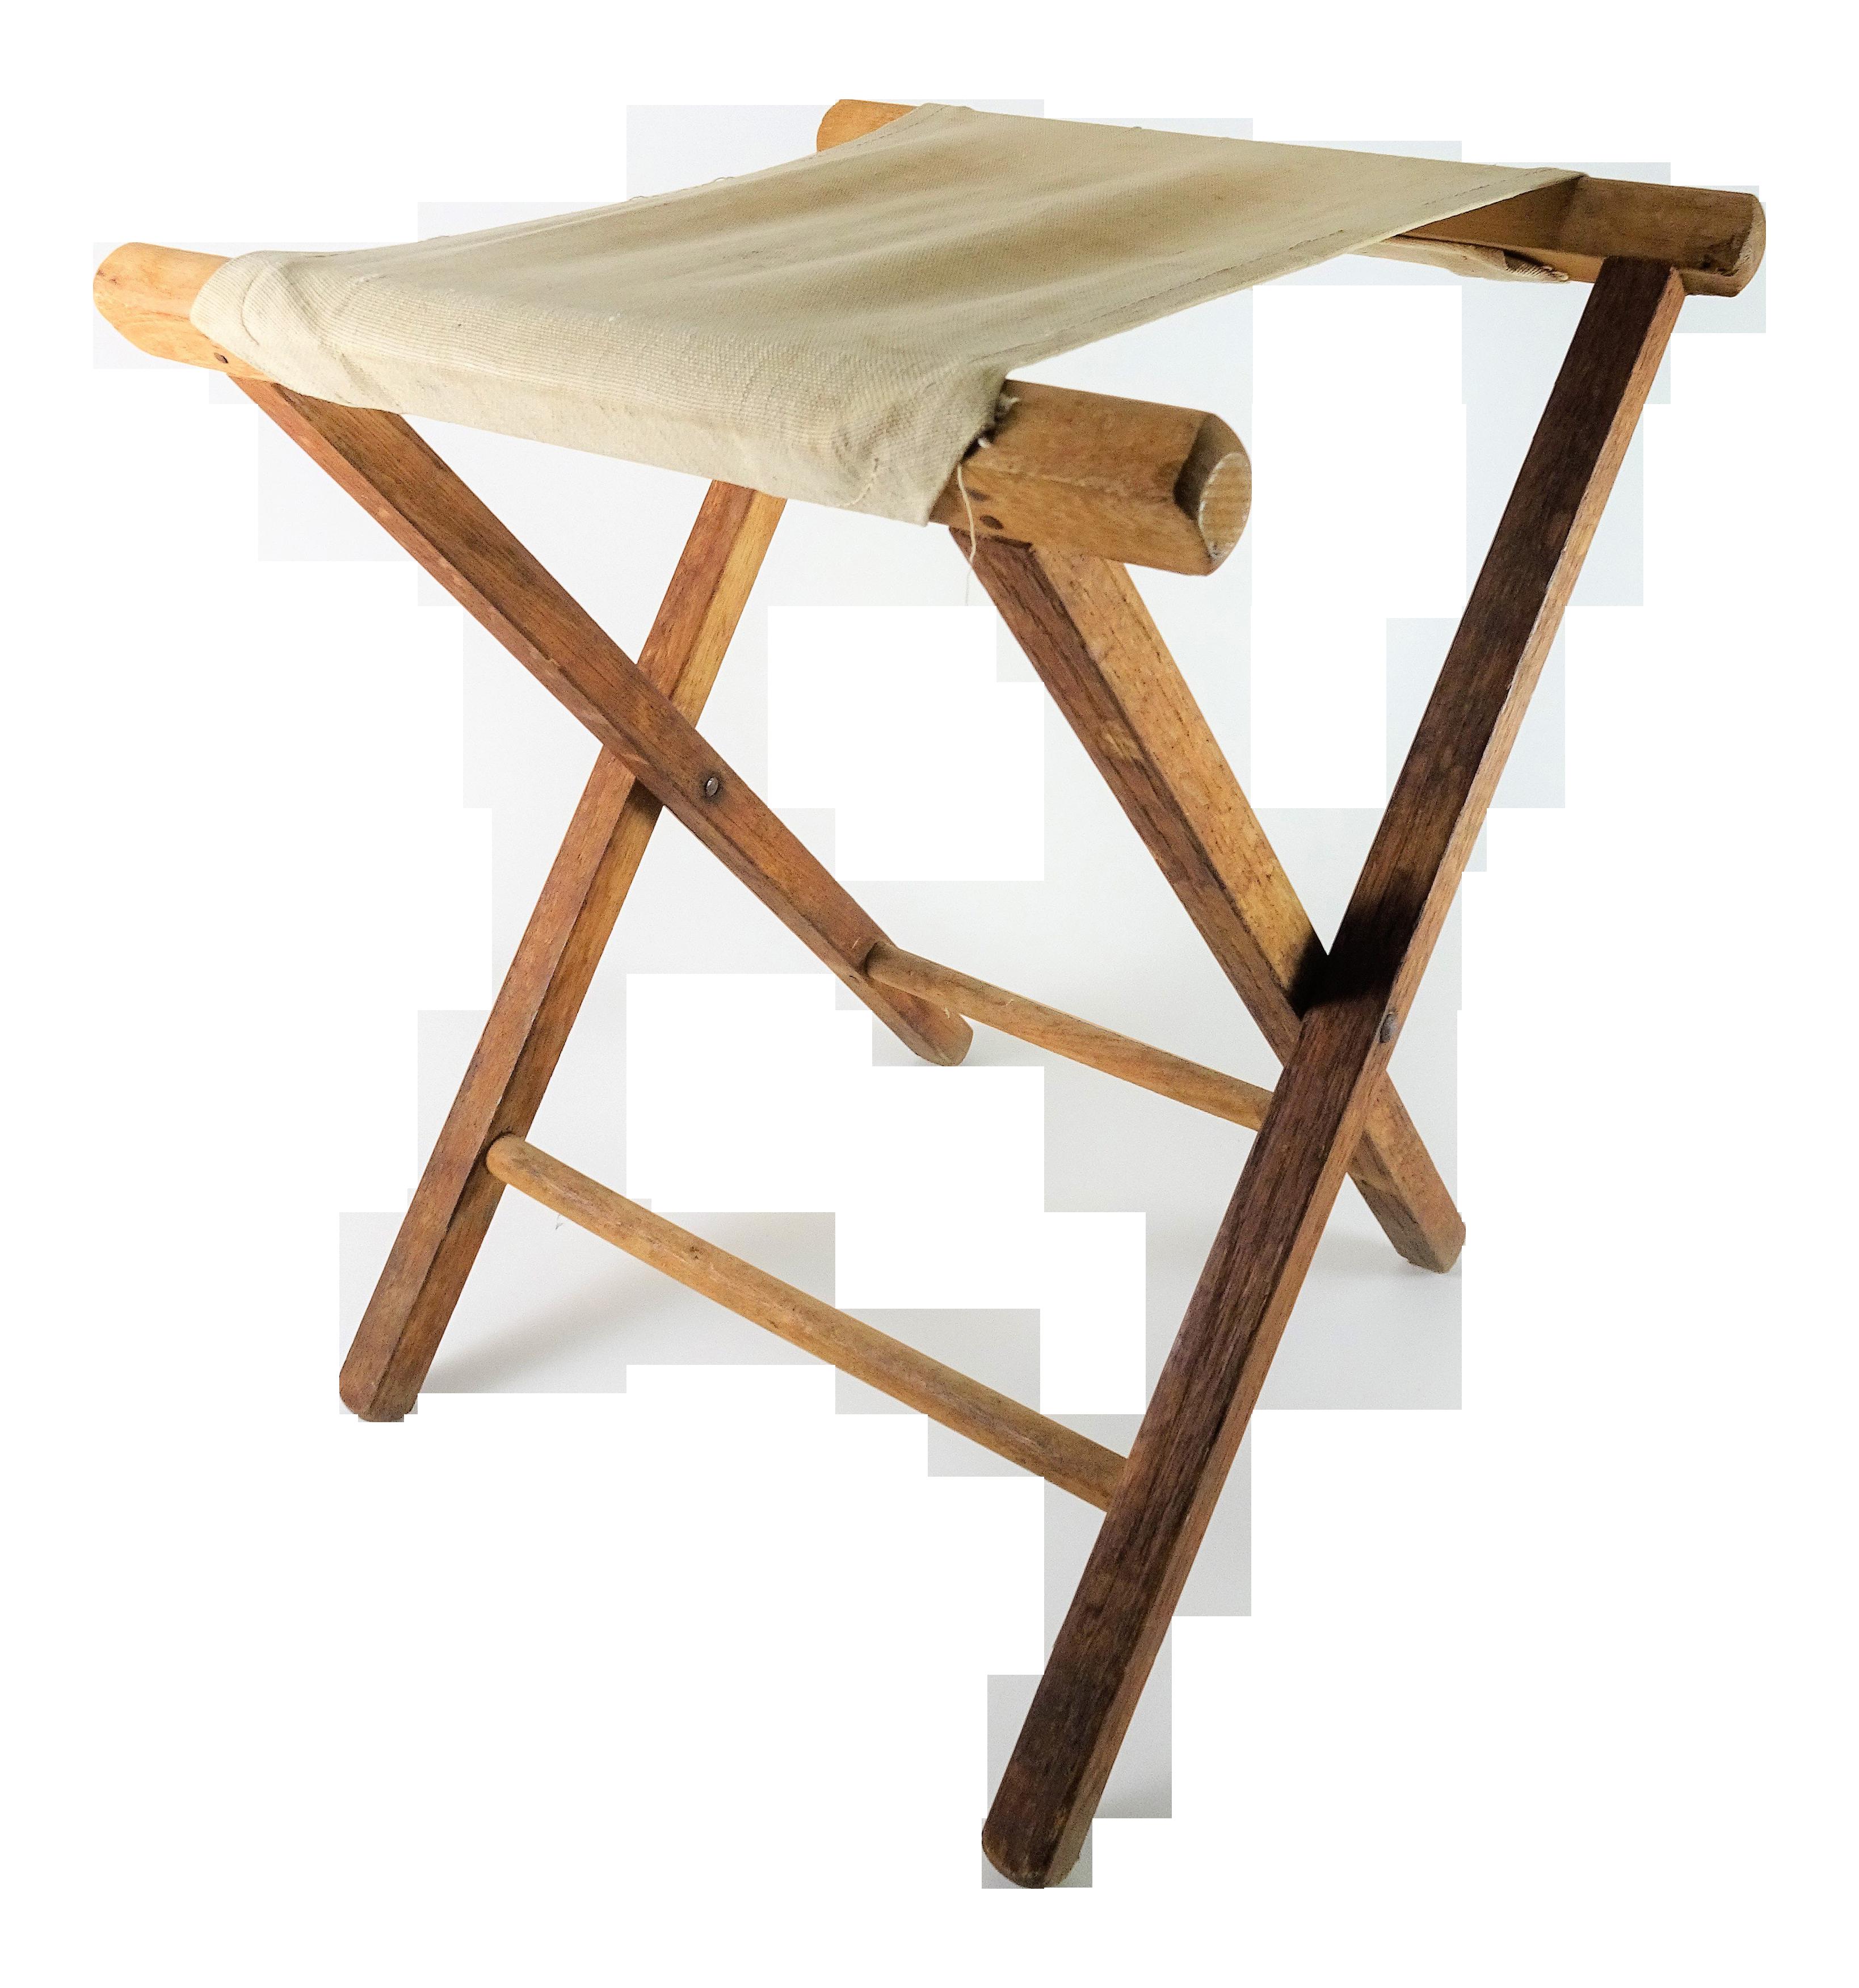 Fantastic Vintage Rustic Folding Wood Camp Stool Bralicious Painted Fabric Chair Ideas Braliciousco